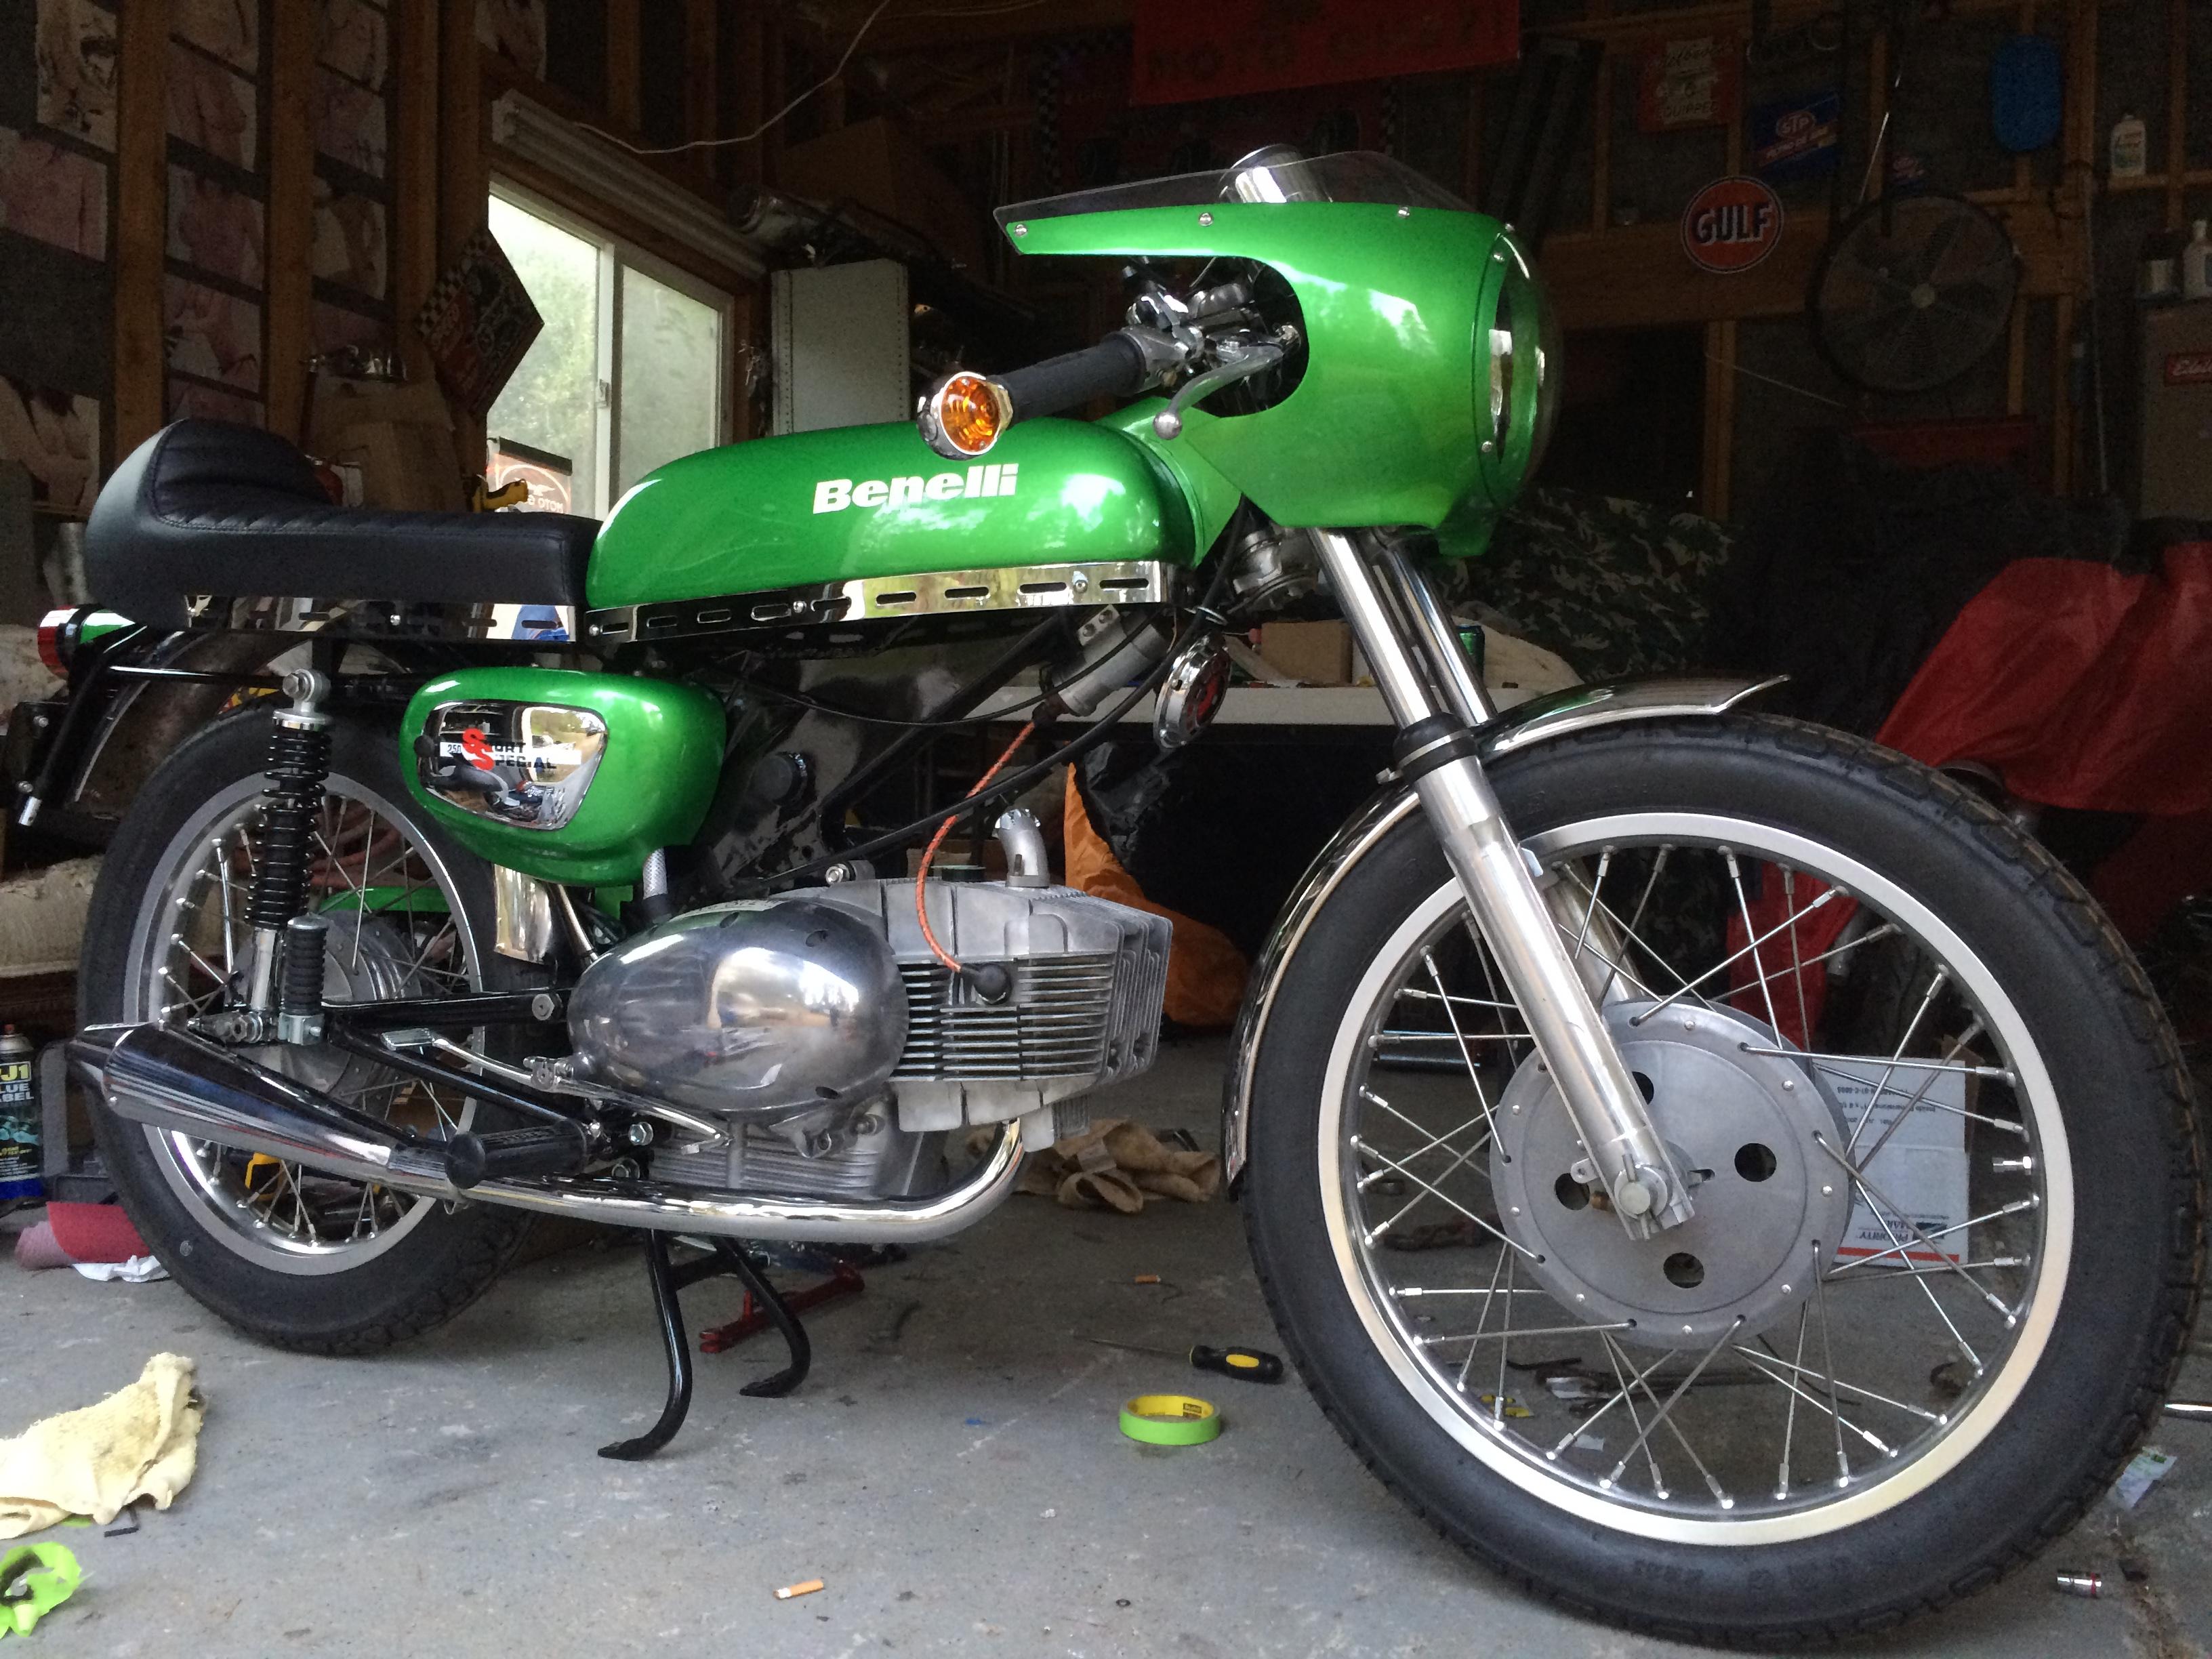 New 1973 250 SS owner (needs restoration)-img_5954_1519608524761.jpg